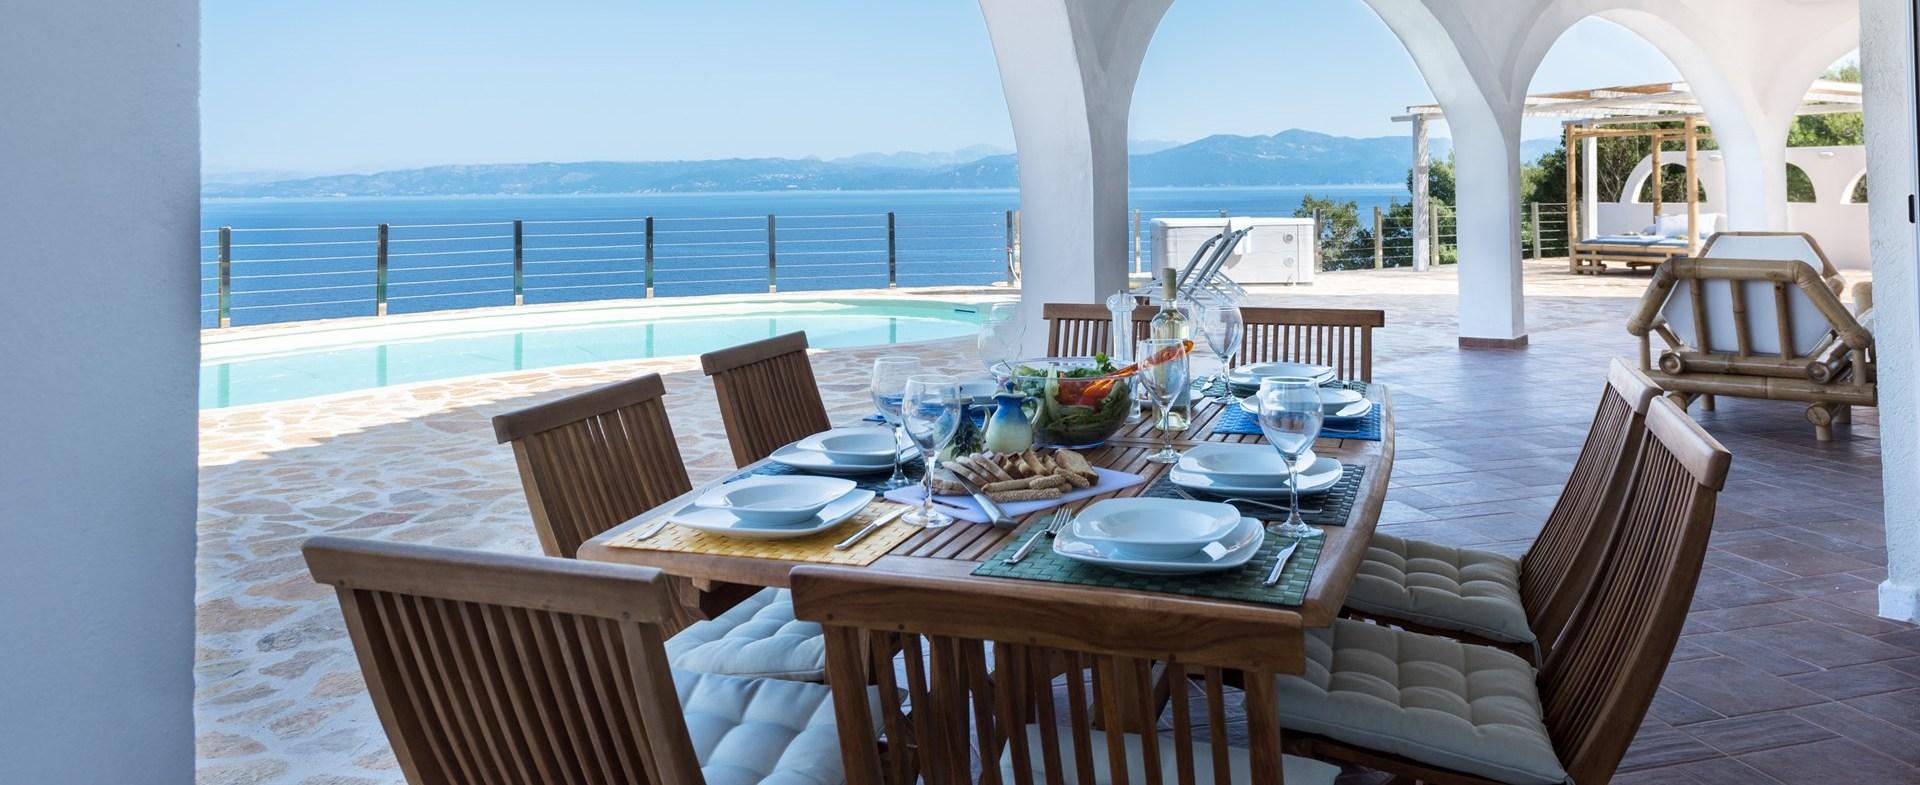 villa-pandora-paxos-pool-terrace